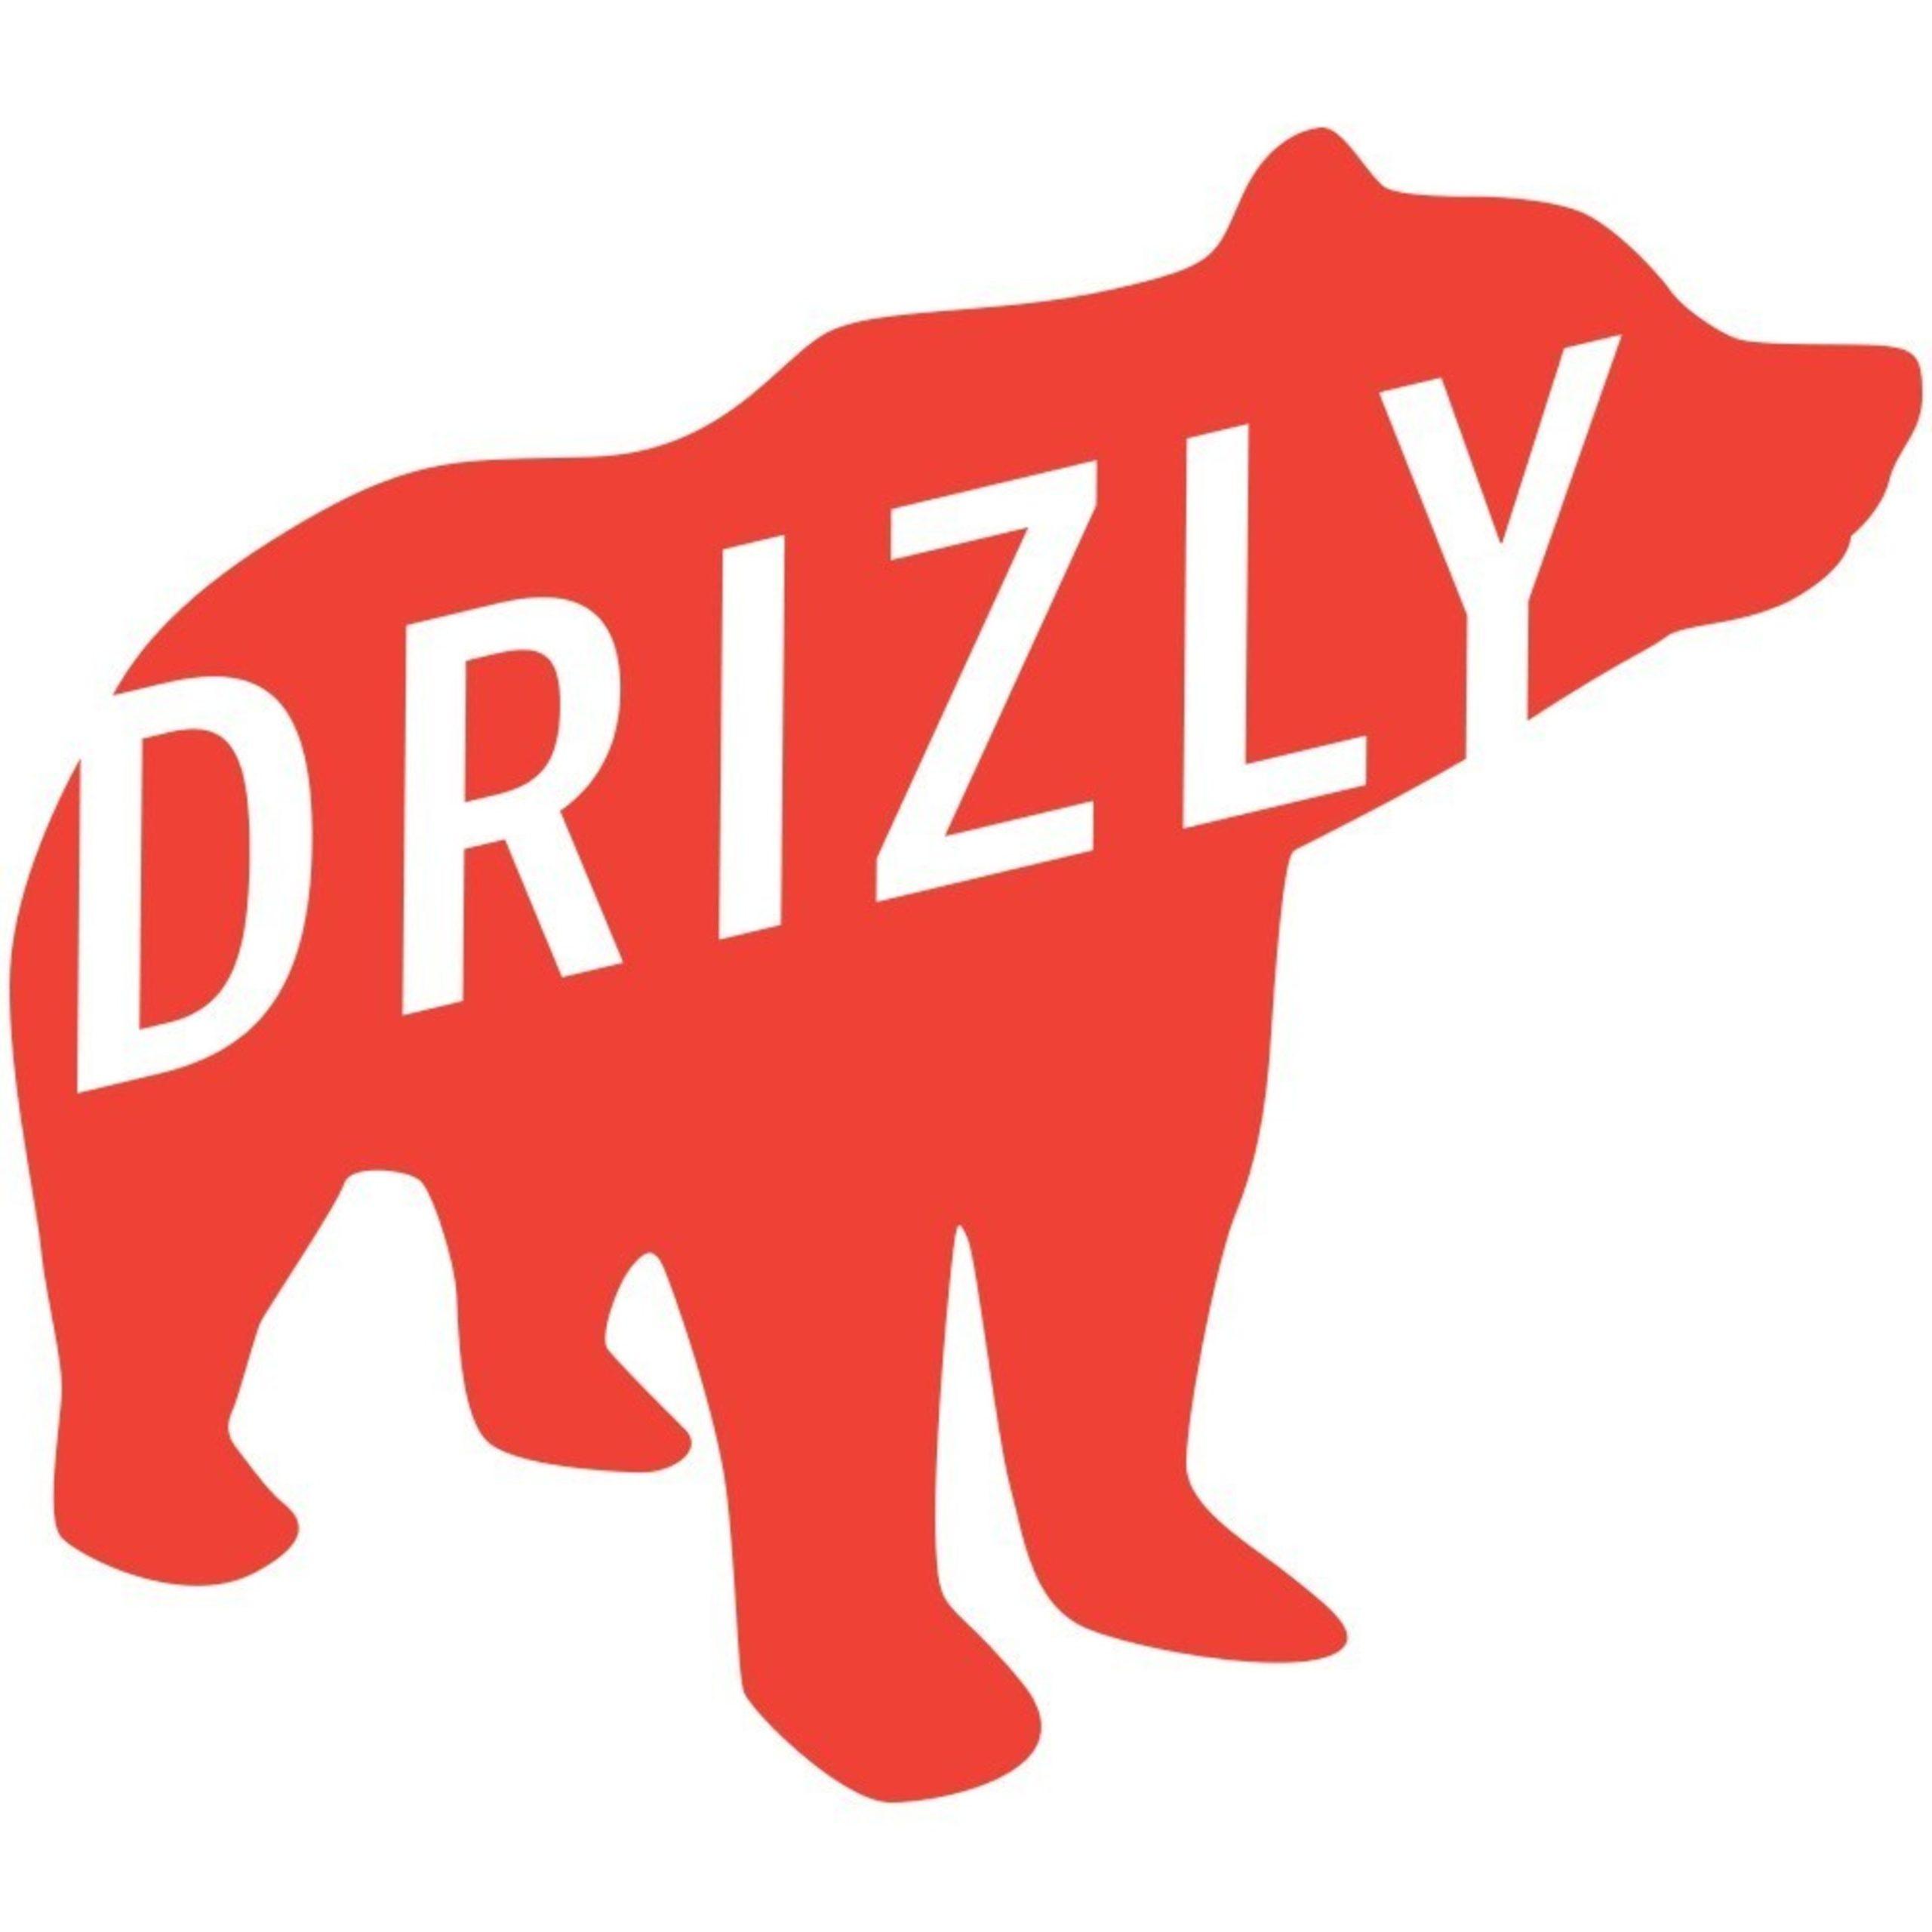 Drizly Bear Logo